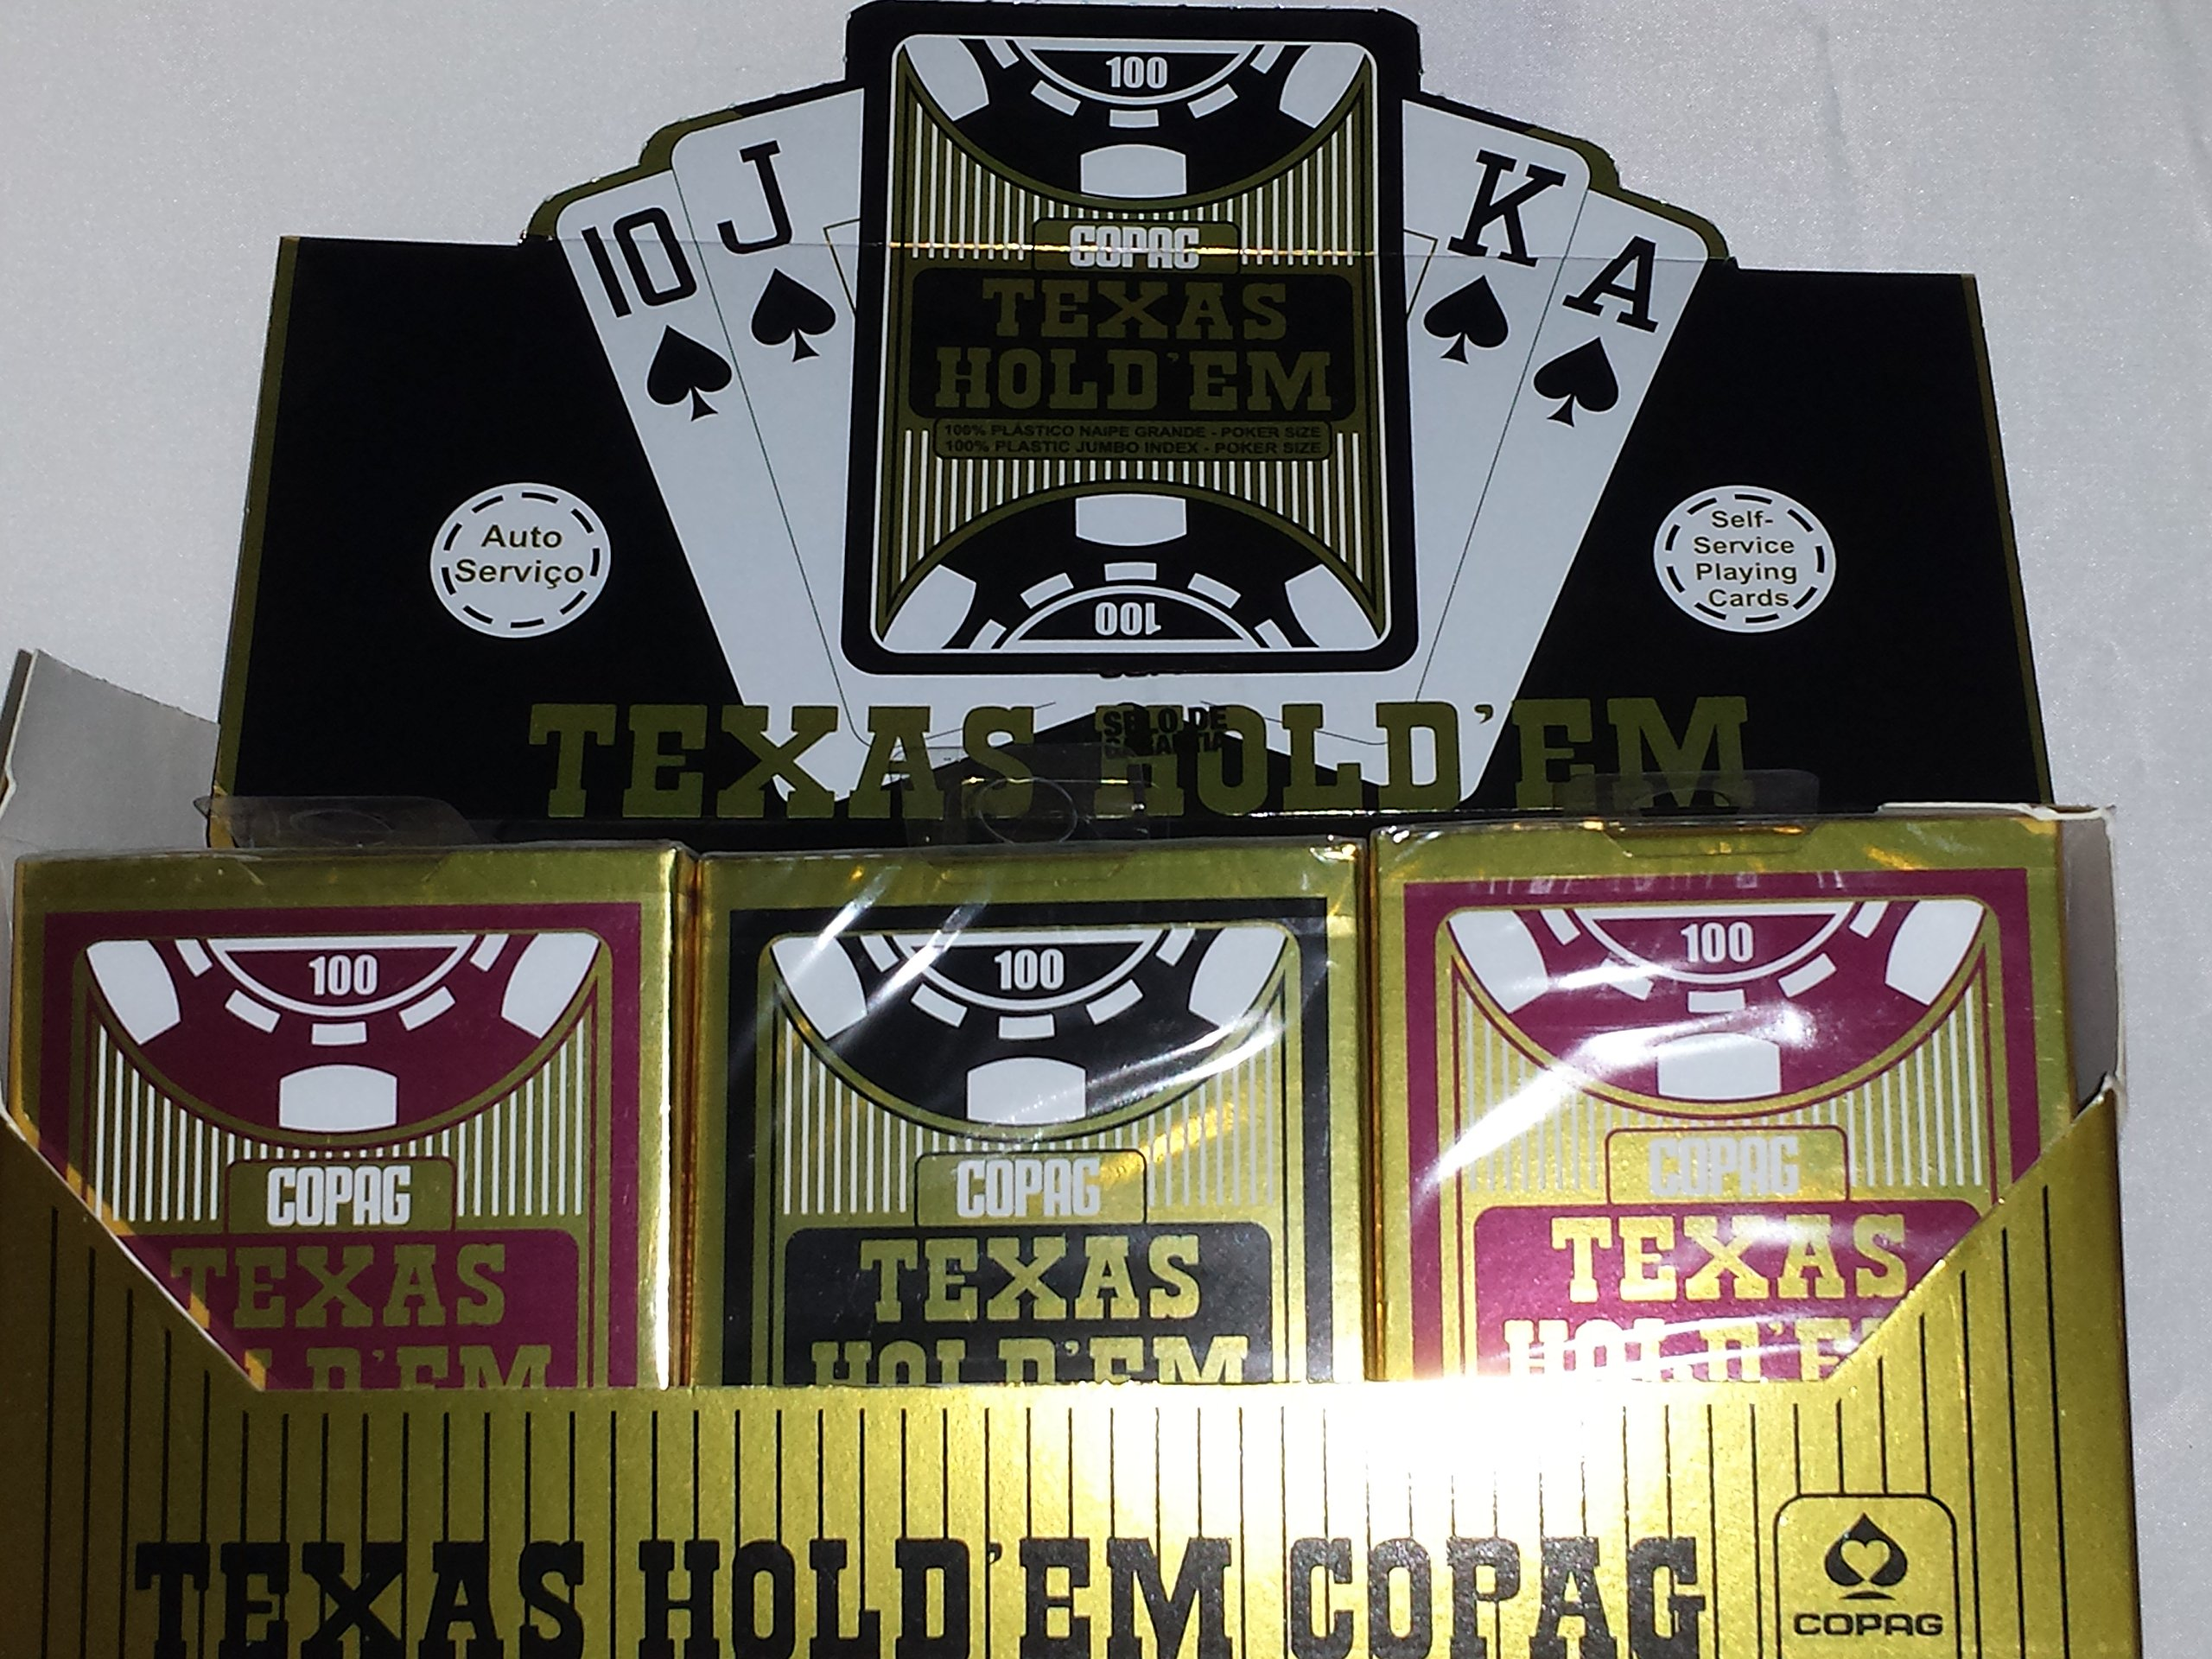 Copag 100% Plastic Playing Cards - Texas Hold 'Em Poker Size Jumbo Index Red/Black - 12 Decks